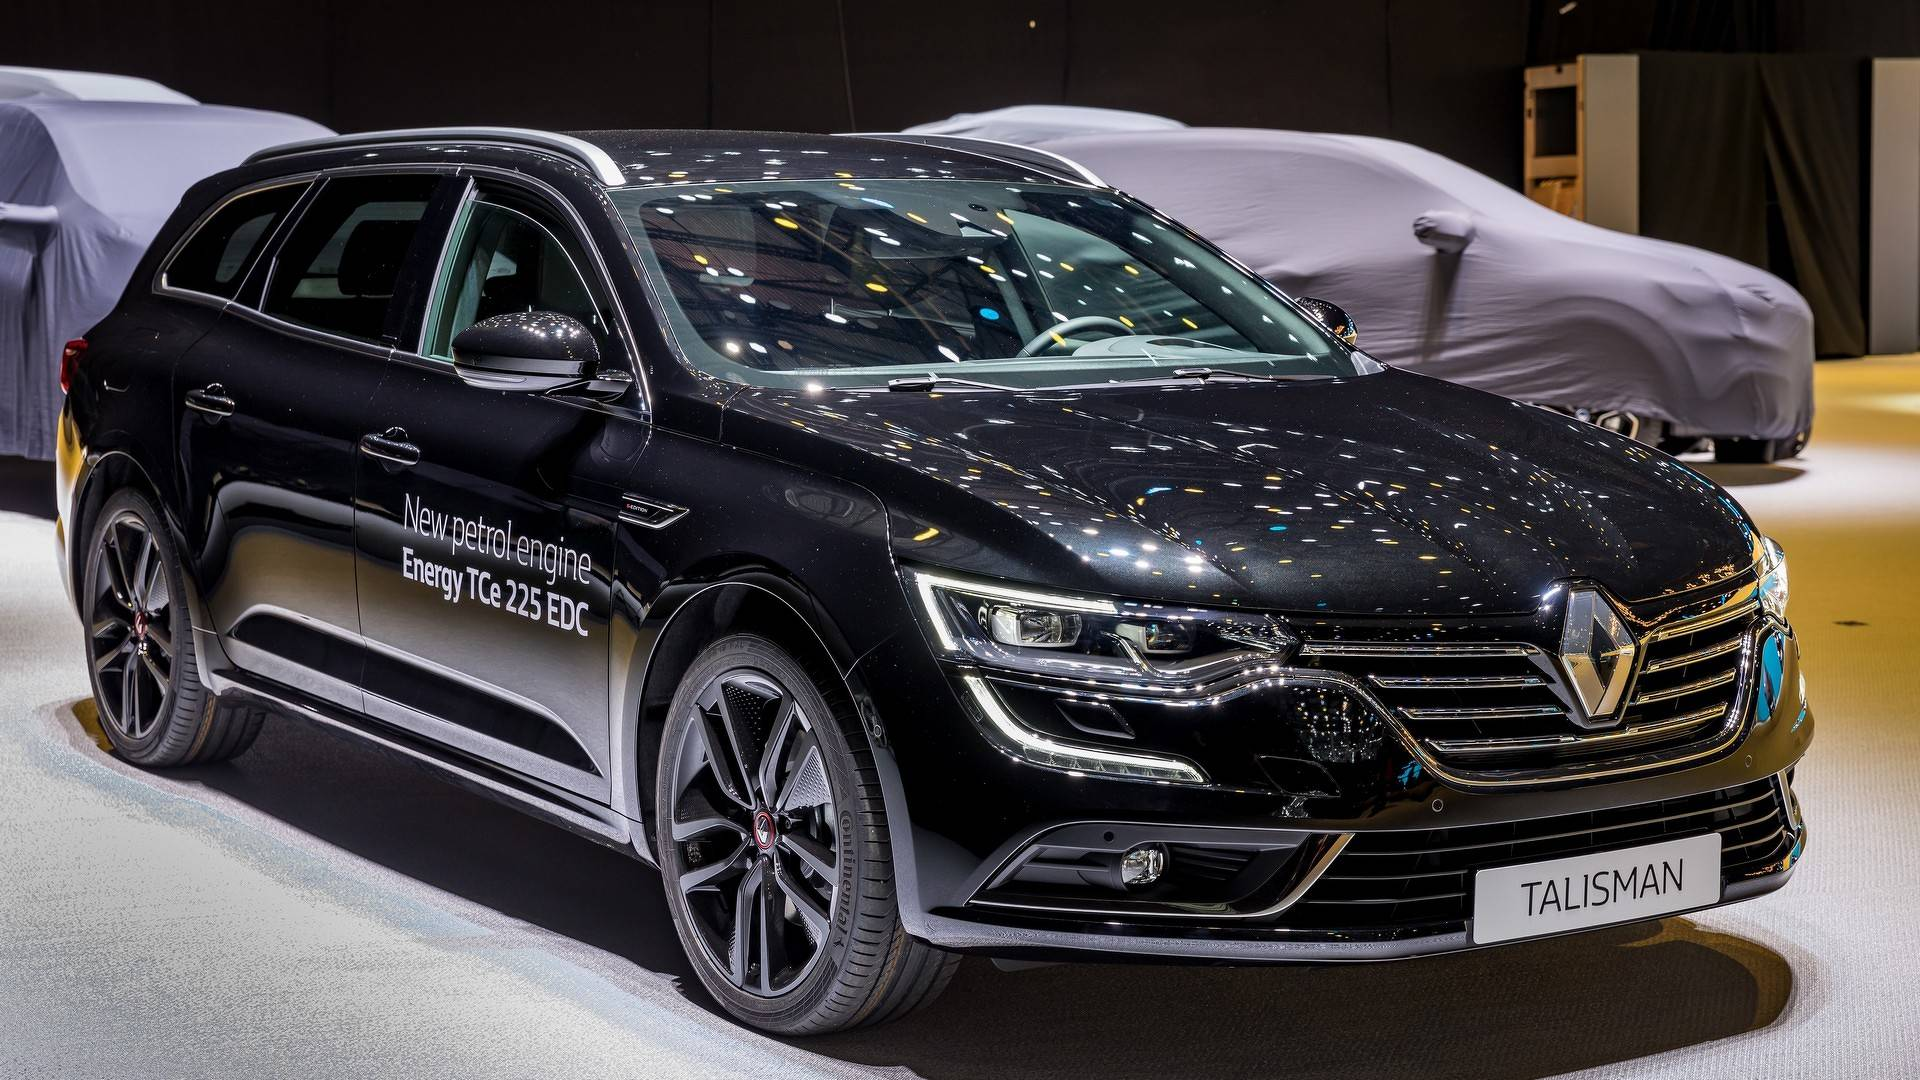 2018 - Renault TALISMAN S-EDITION